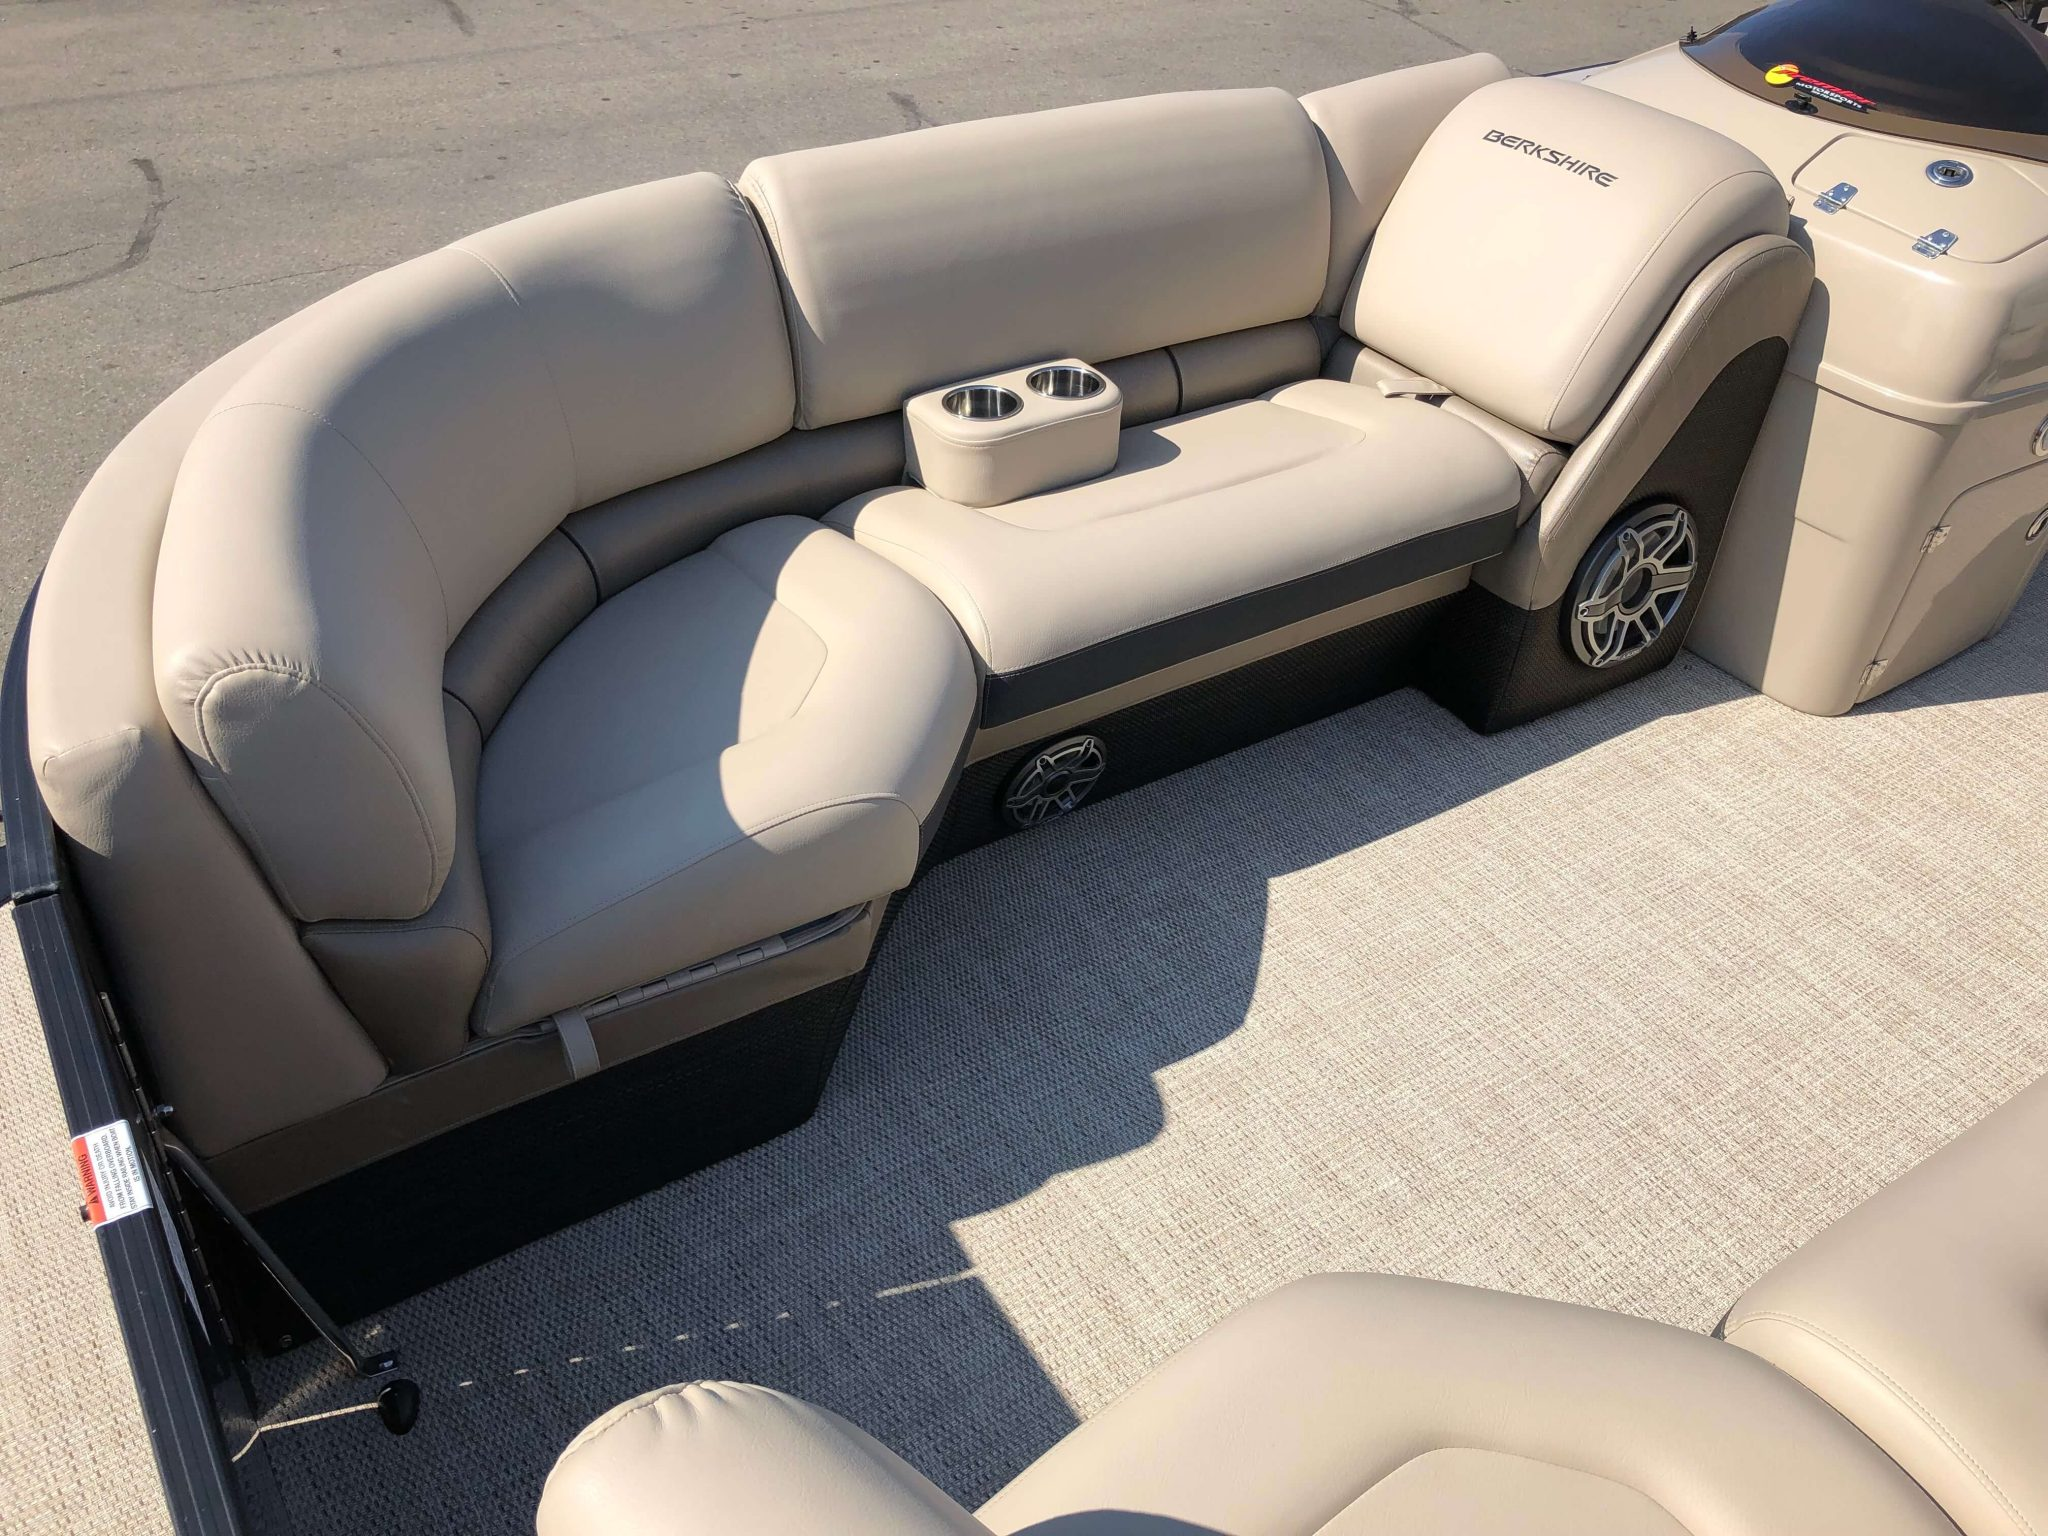 2019 Berkshire 25RFX STS Luxury Tritoon Seating 3